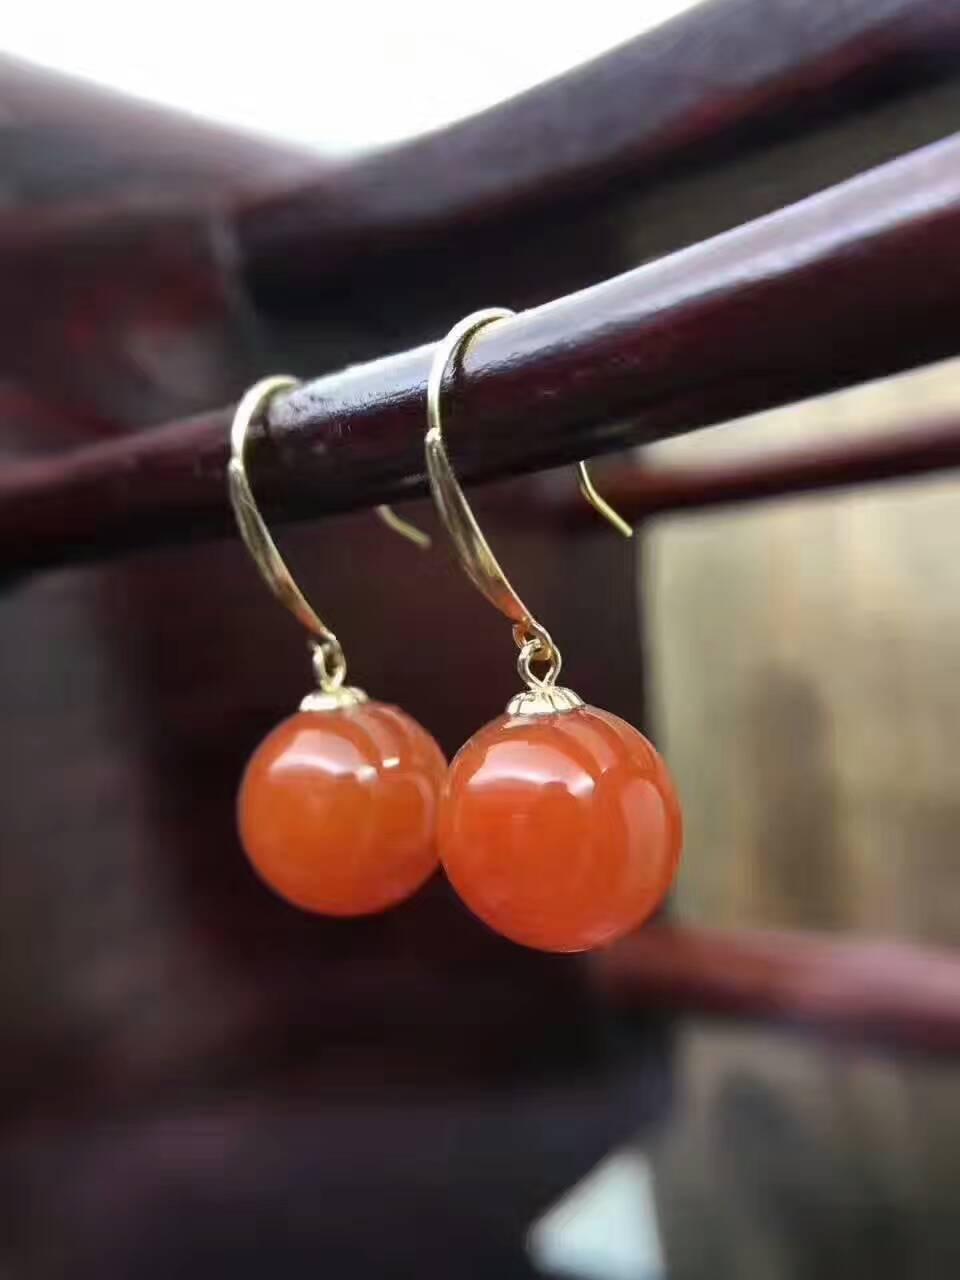 Earings Fashion Jewelry Lanzyo 18k Agate Drop Earrings Fashion Gift For Women Jewelry South Trendy New Wholesale E9.59.501agnh